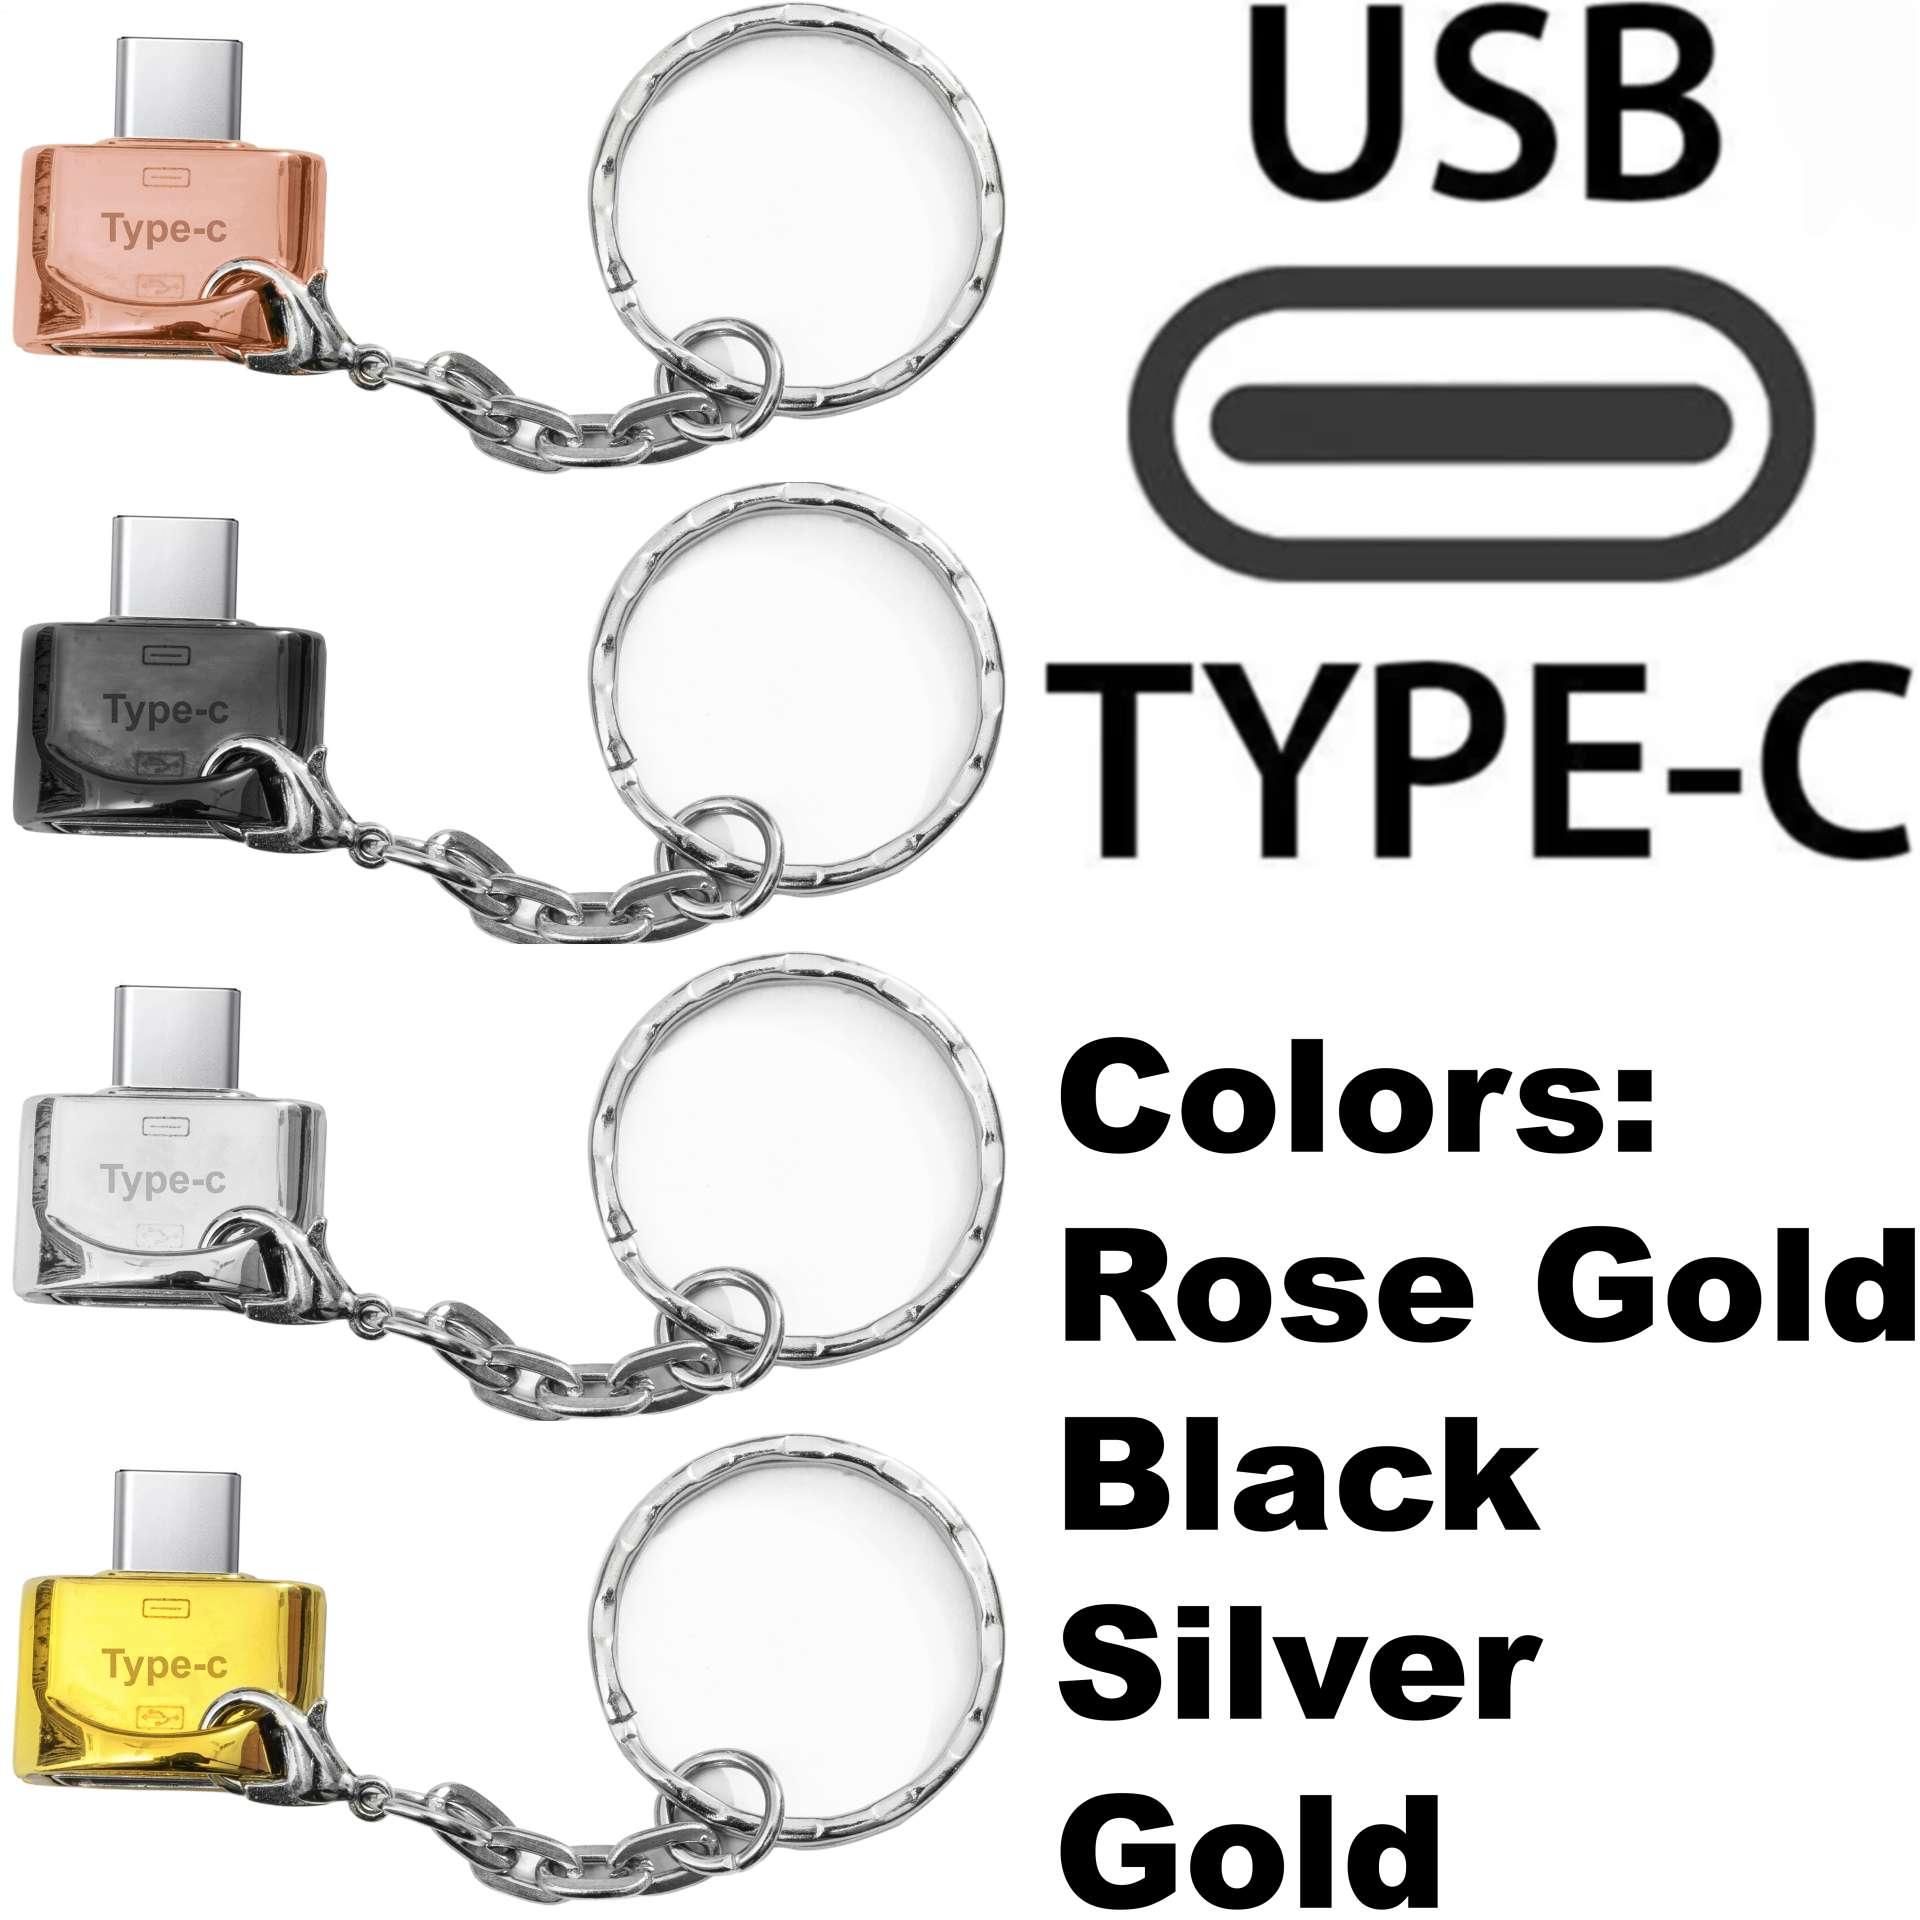 (Metal) OTG Type C Key Ring/Key Chain For Samsung / HTC / Infinix / Xiaomi / Oppo / Huawei